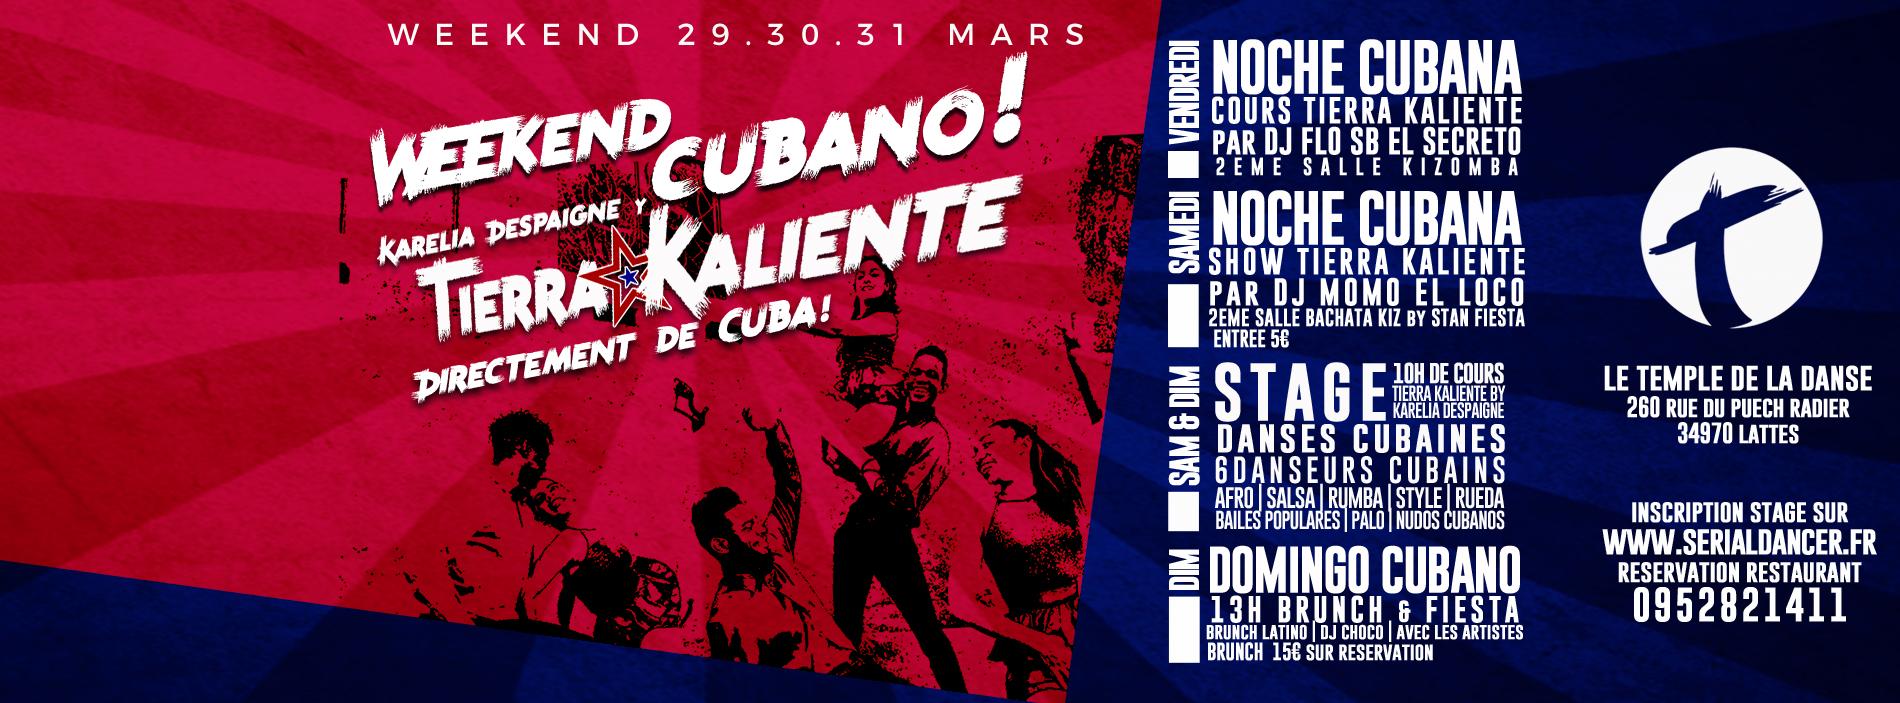 WE29.31MARS – WeekEnd Cubano